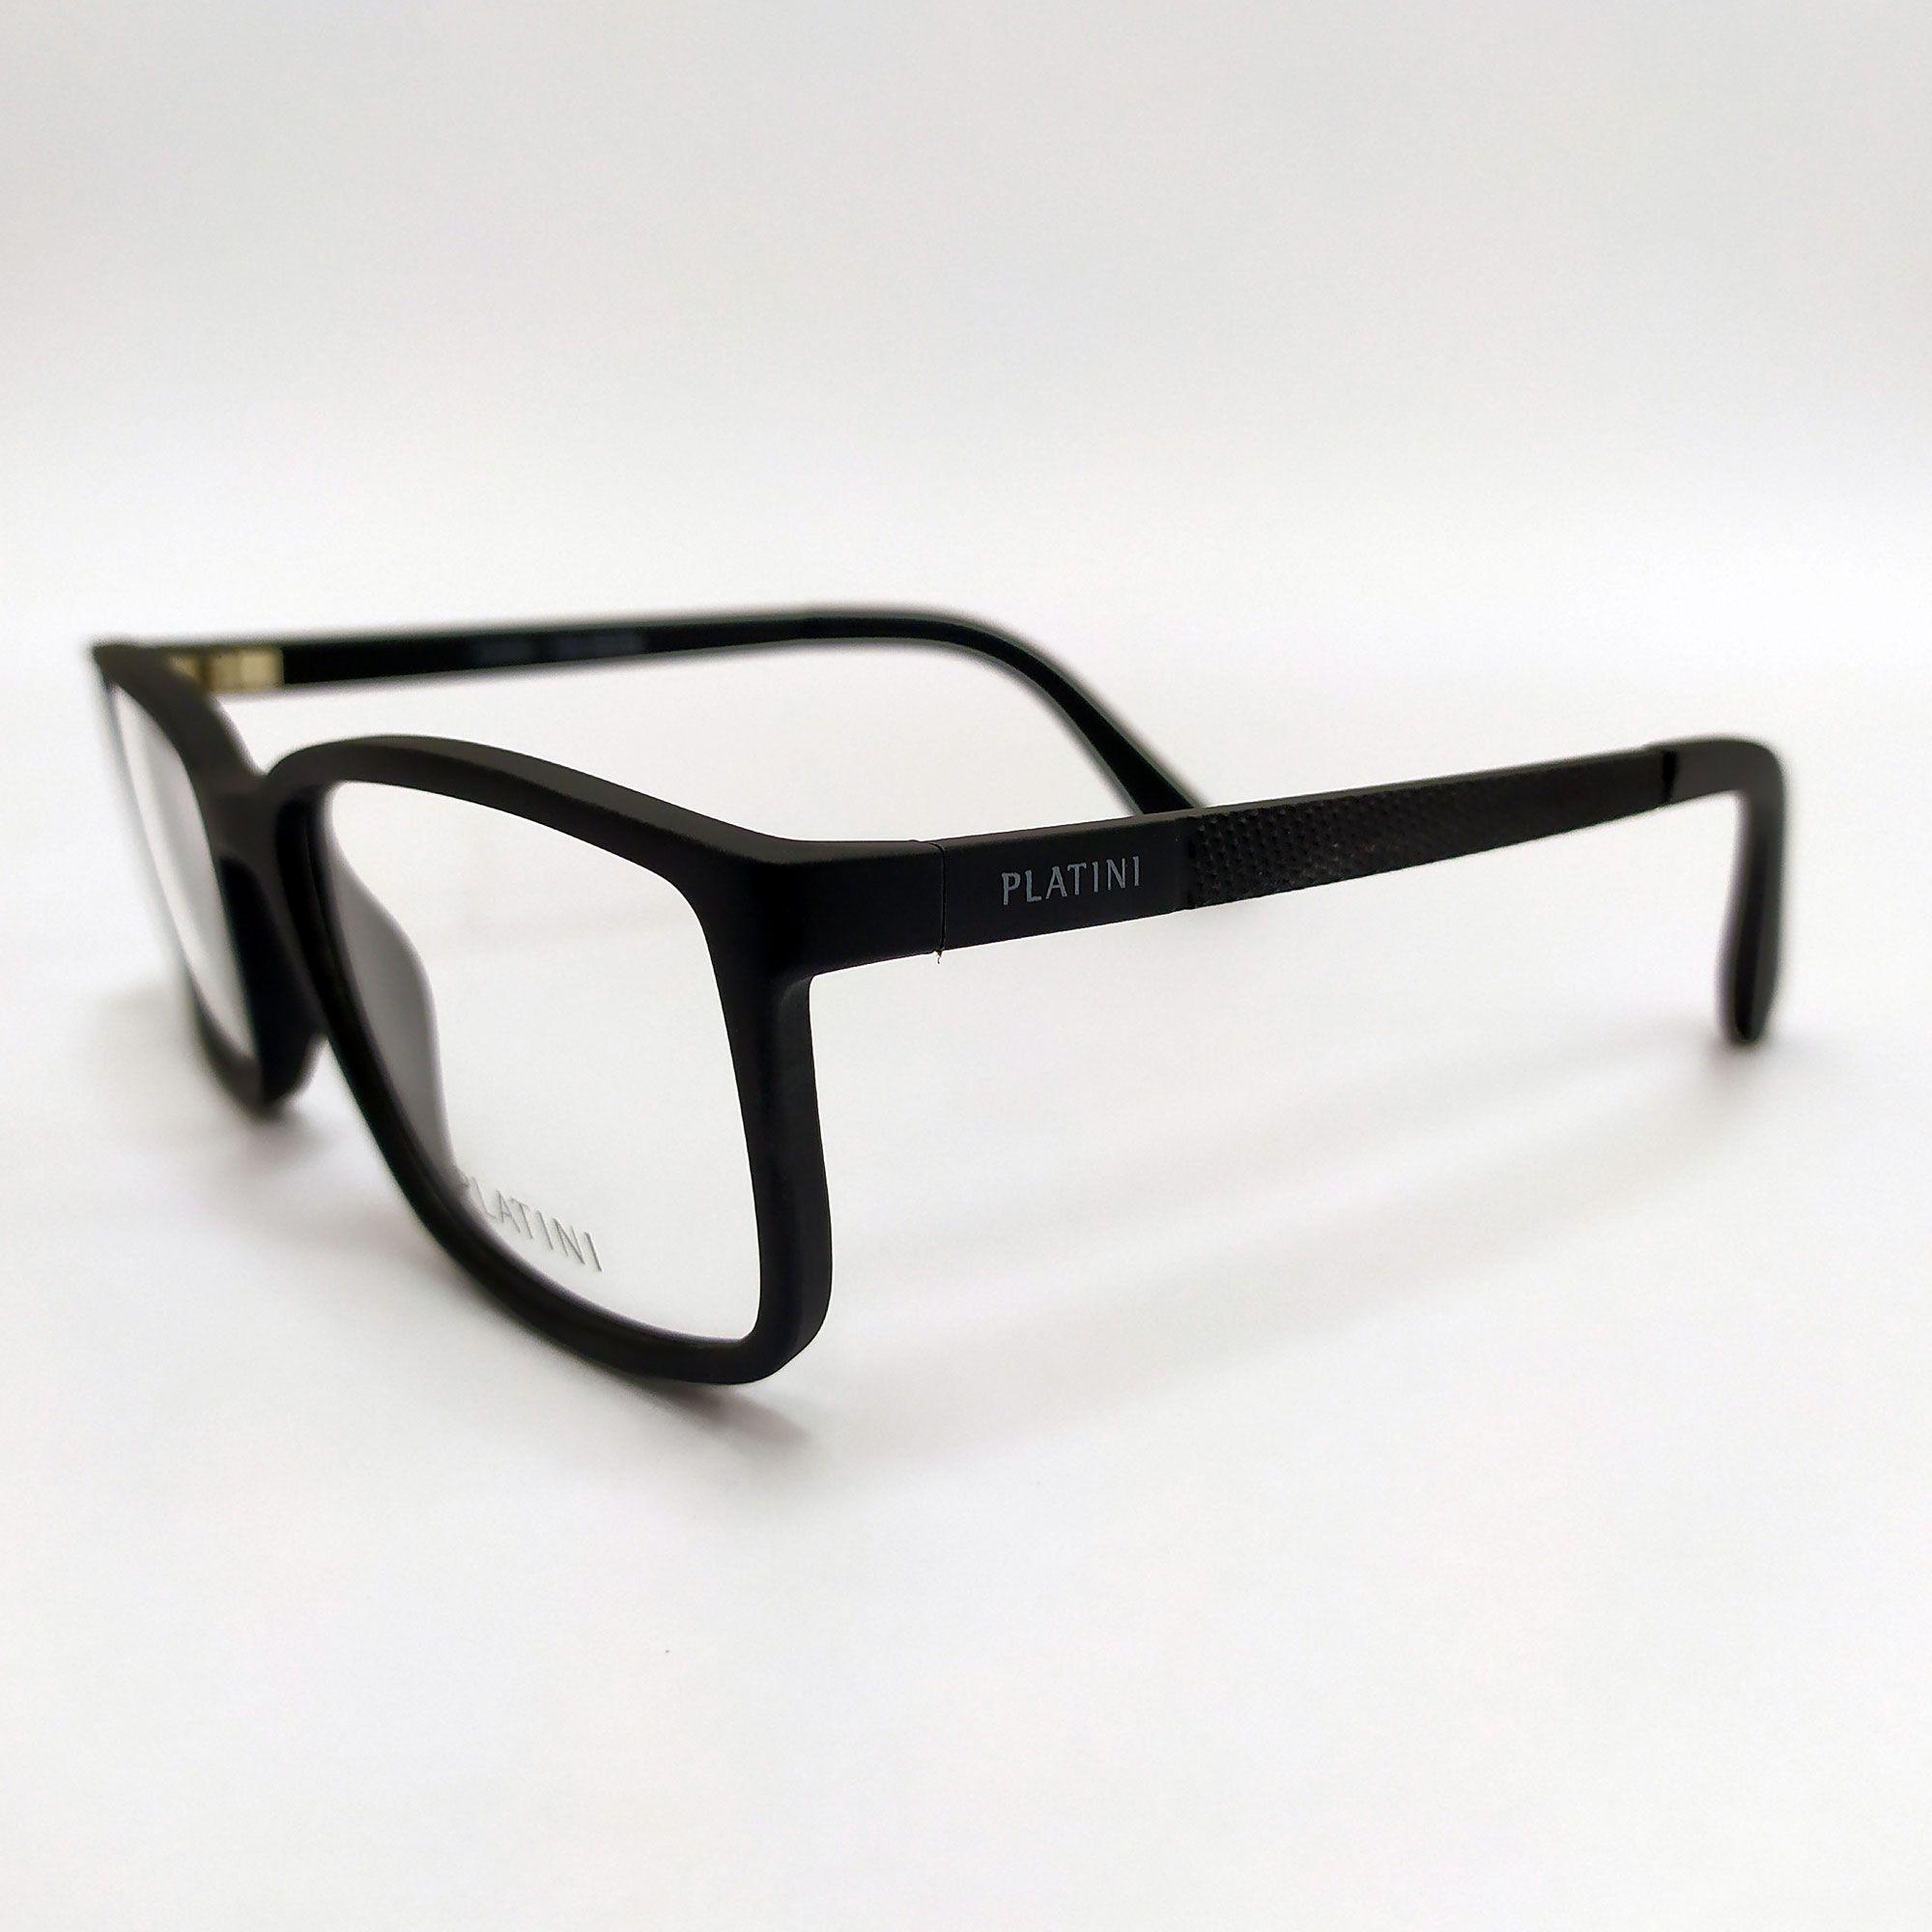 Óculos de Grau Platini Preto P93145 F985